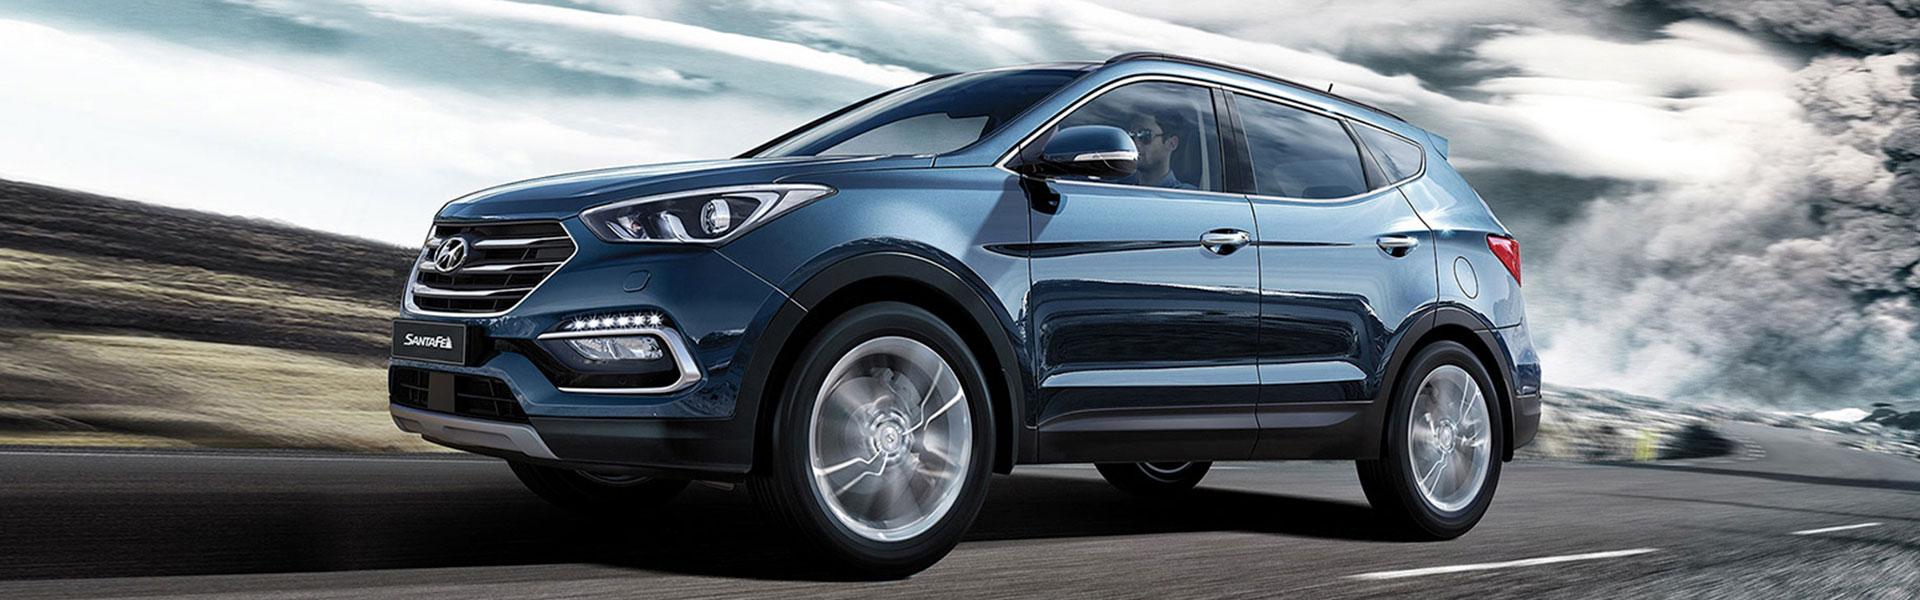 Hyundai Santa Fe - обзор